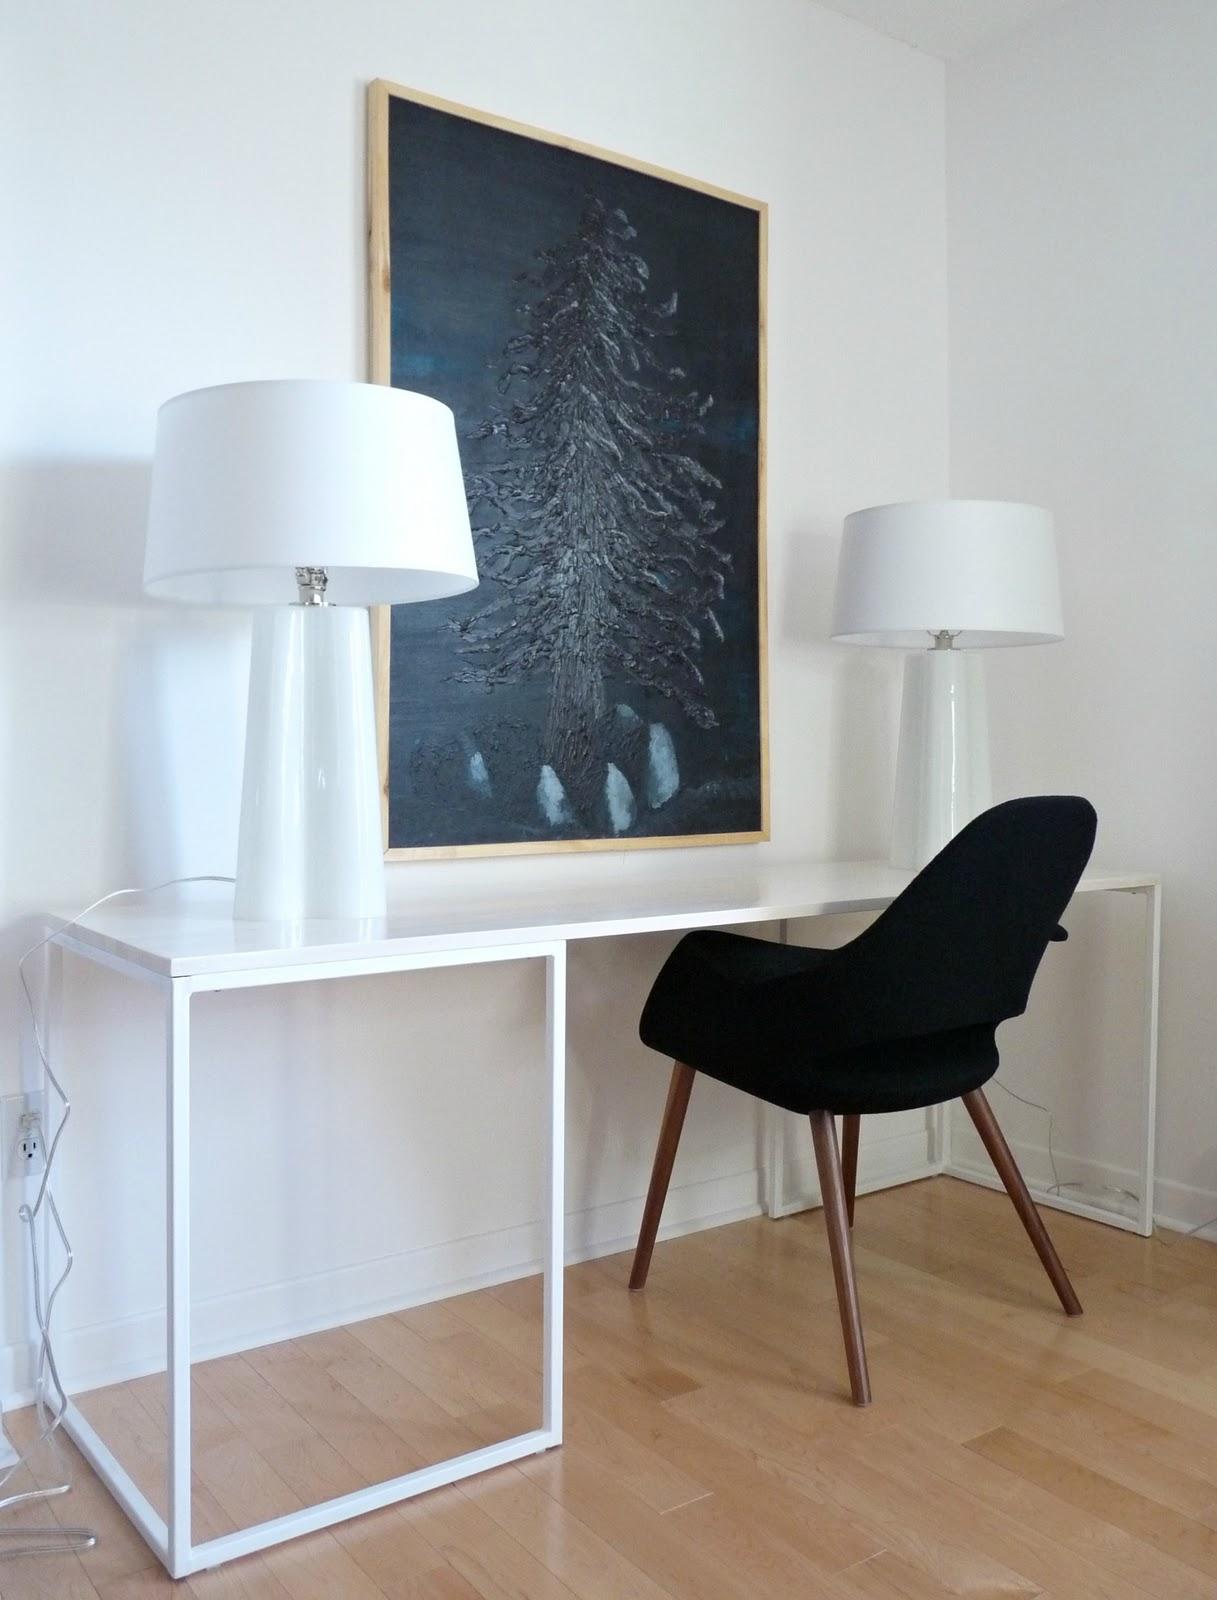 White desk with black chair // Black + white accessories